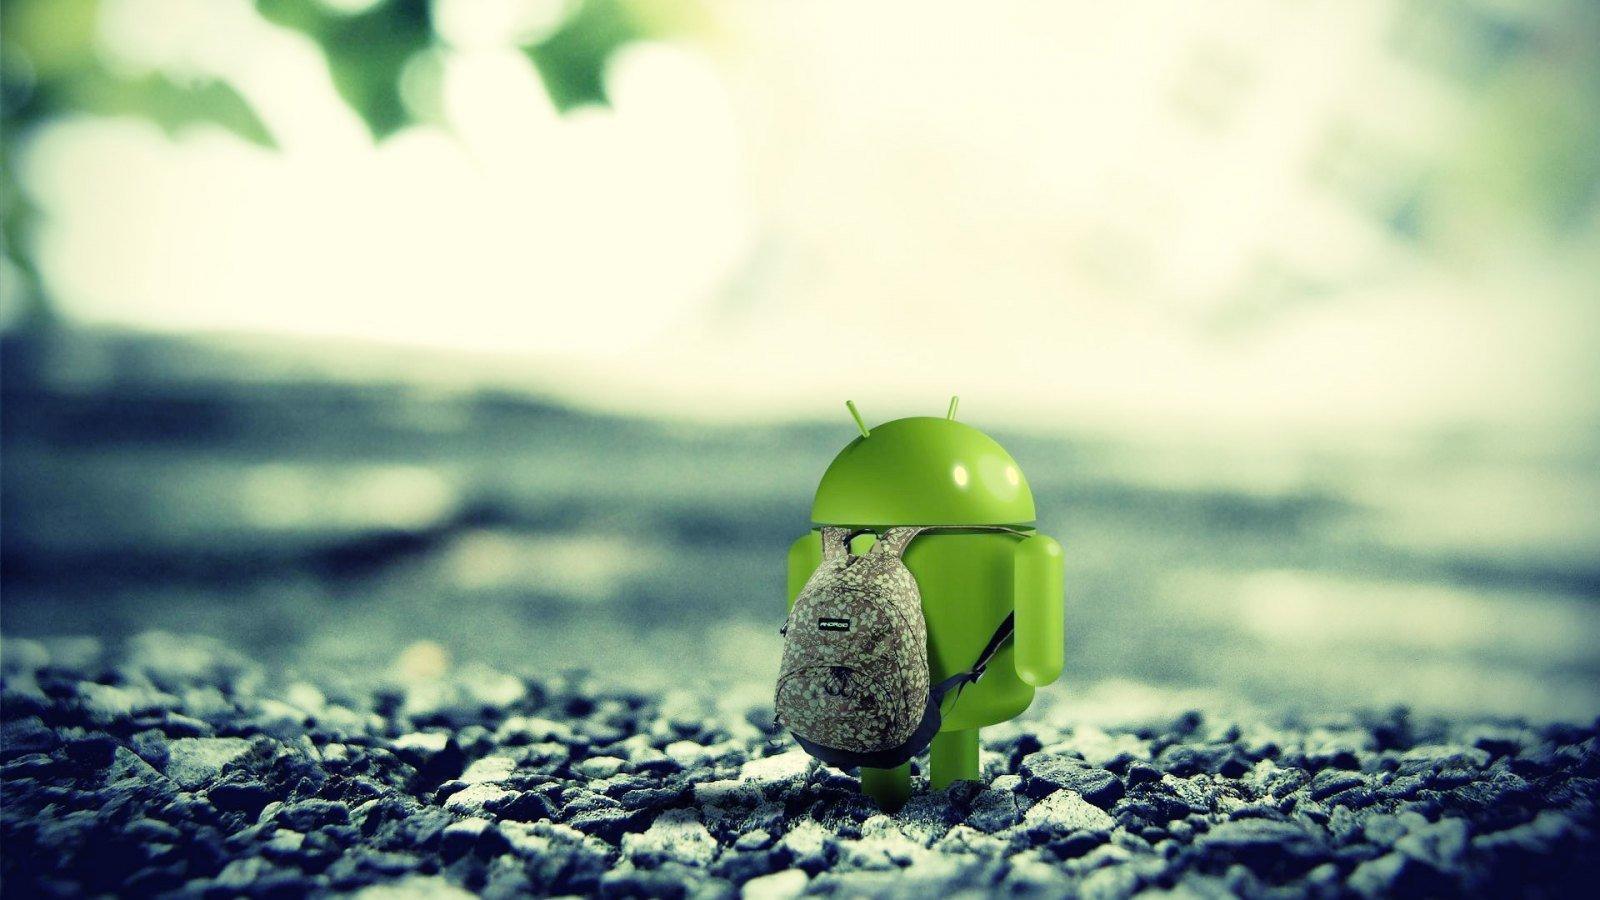 Fondos de pantalla para móvil